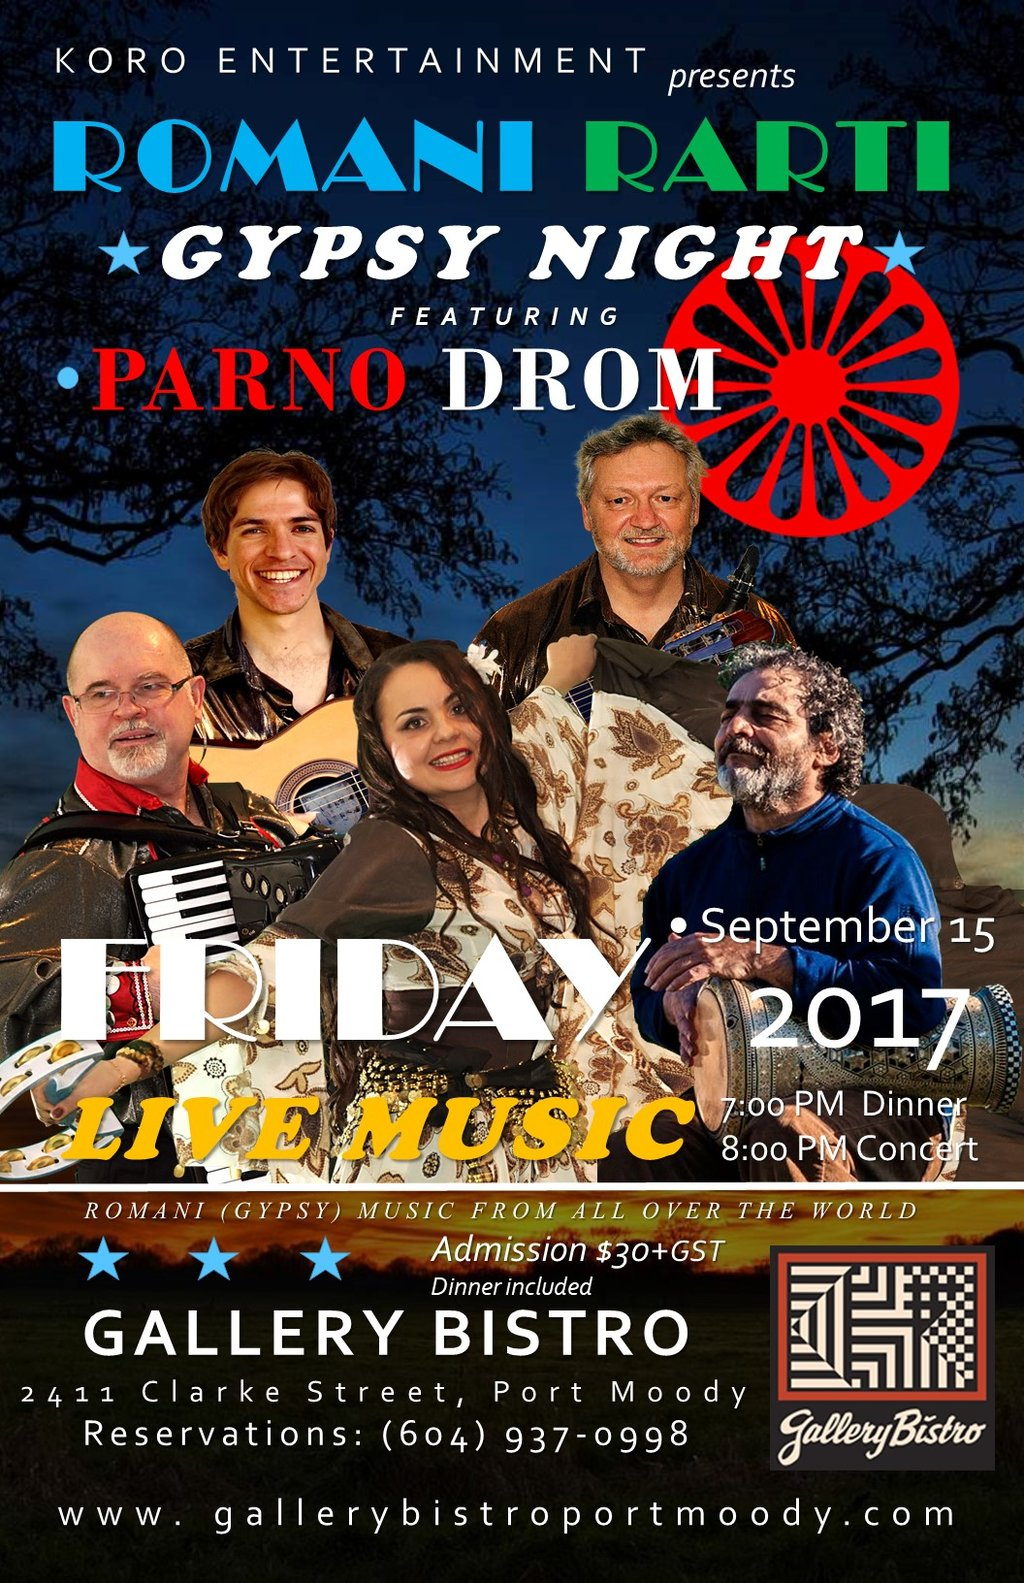 Romani Rarti-Gypsy Night: Parno Drom @ Gallery Bistro - Sep 15, 2017